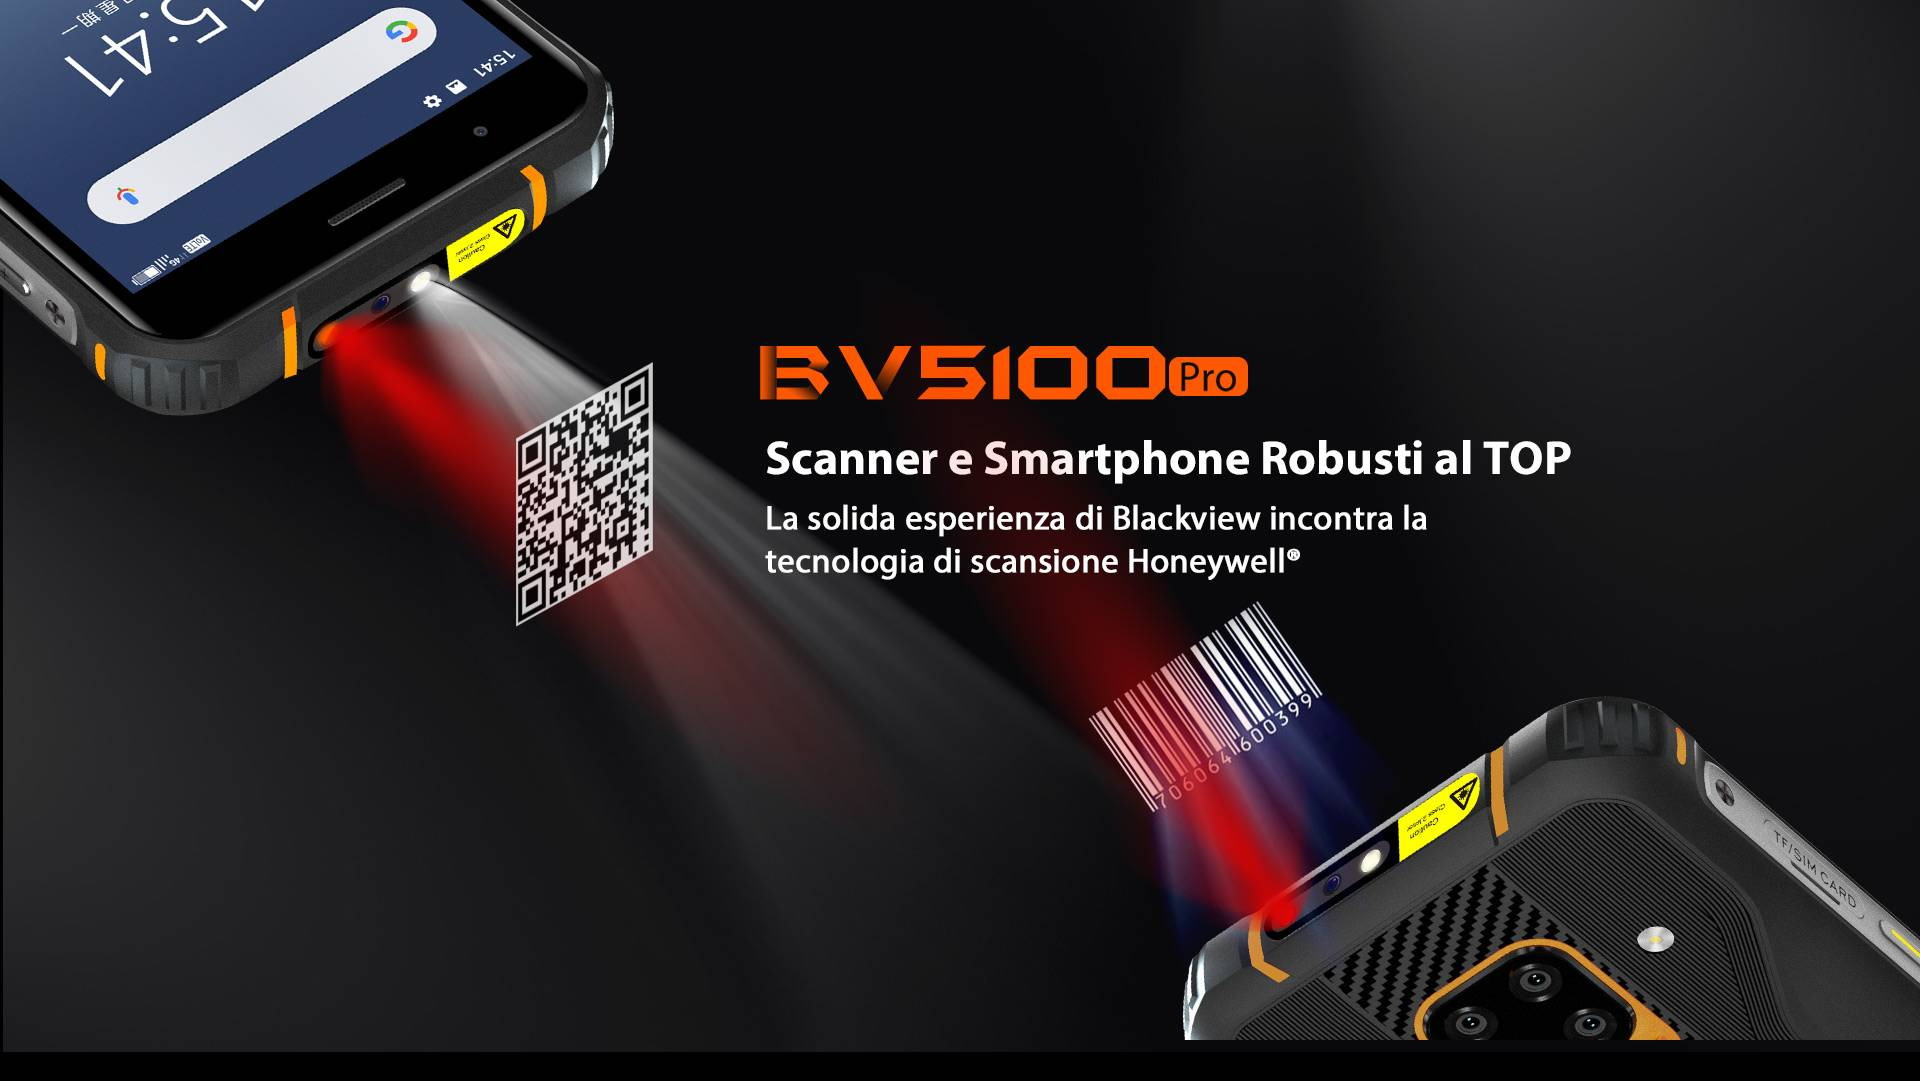 bv5100 pro rugged